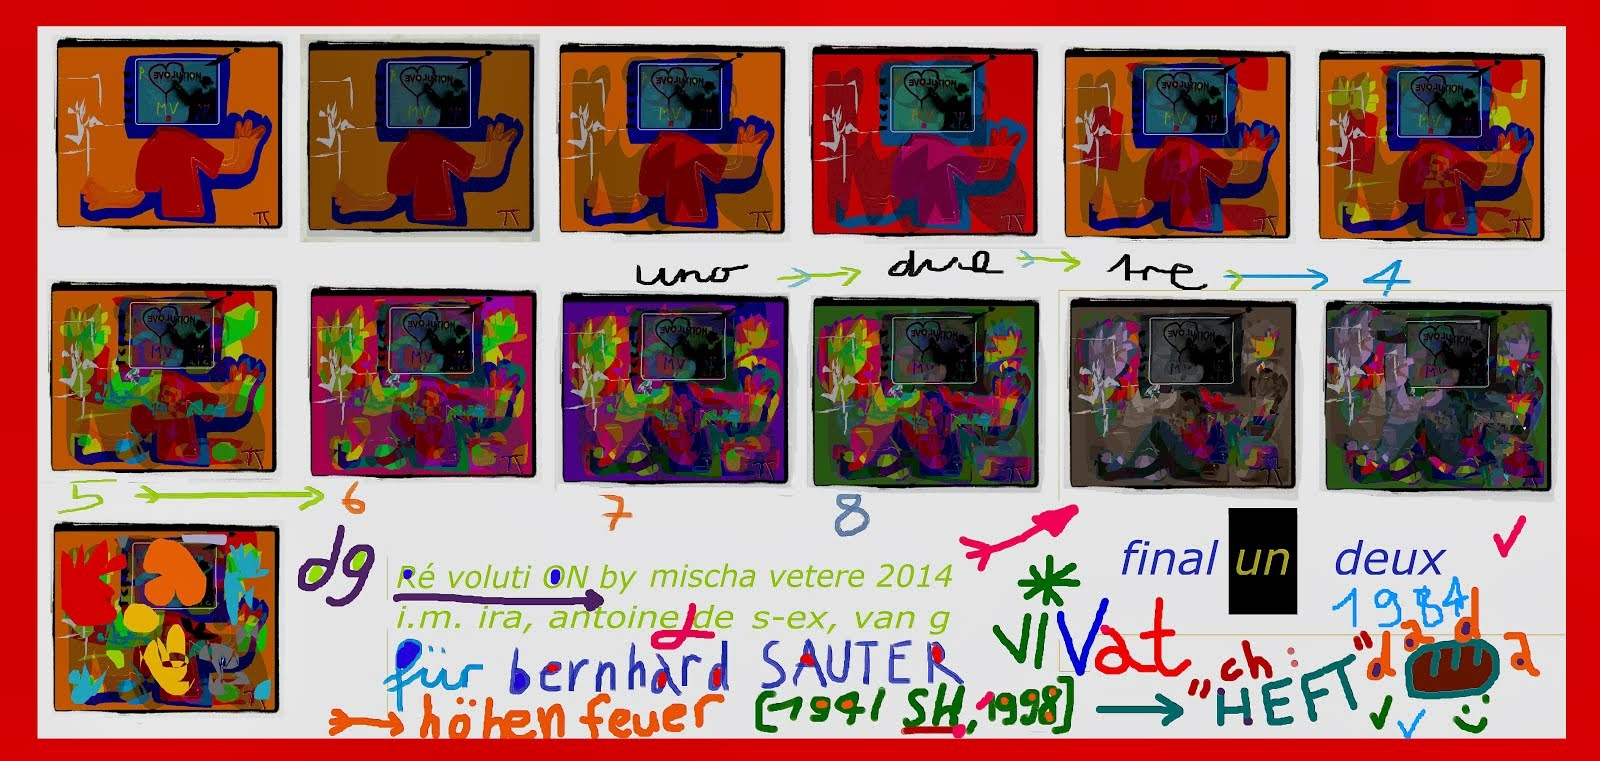 mischa vetere genese bild als seeschule (sehschule) kreativitätSförderung inspiration genese